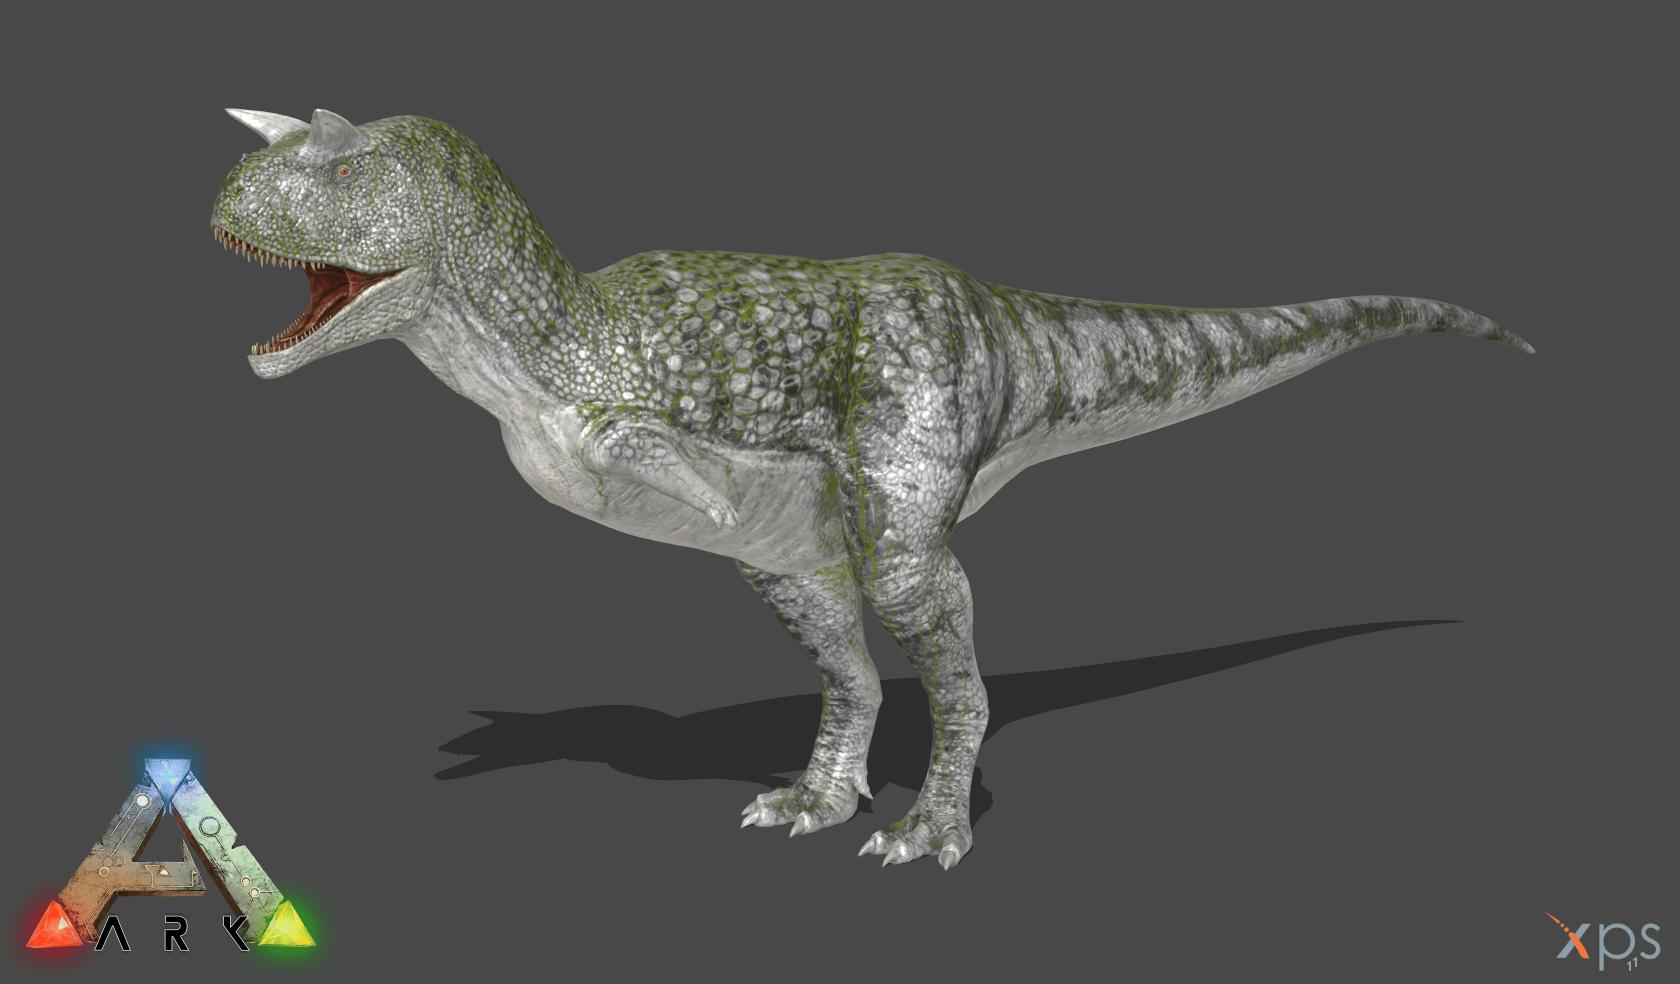 [arkse] Carnotaurus By Phelcer On Deviantart